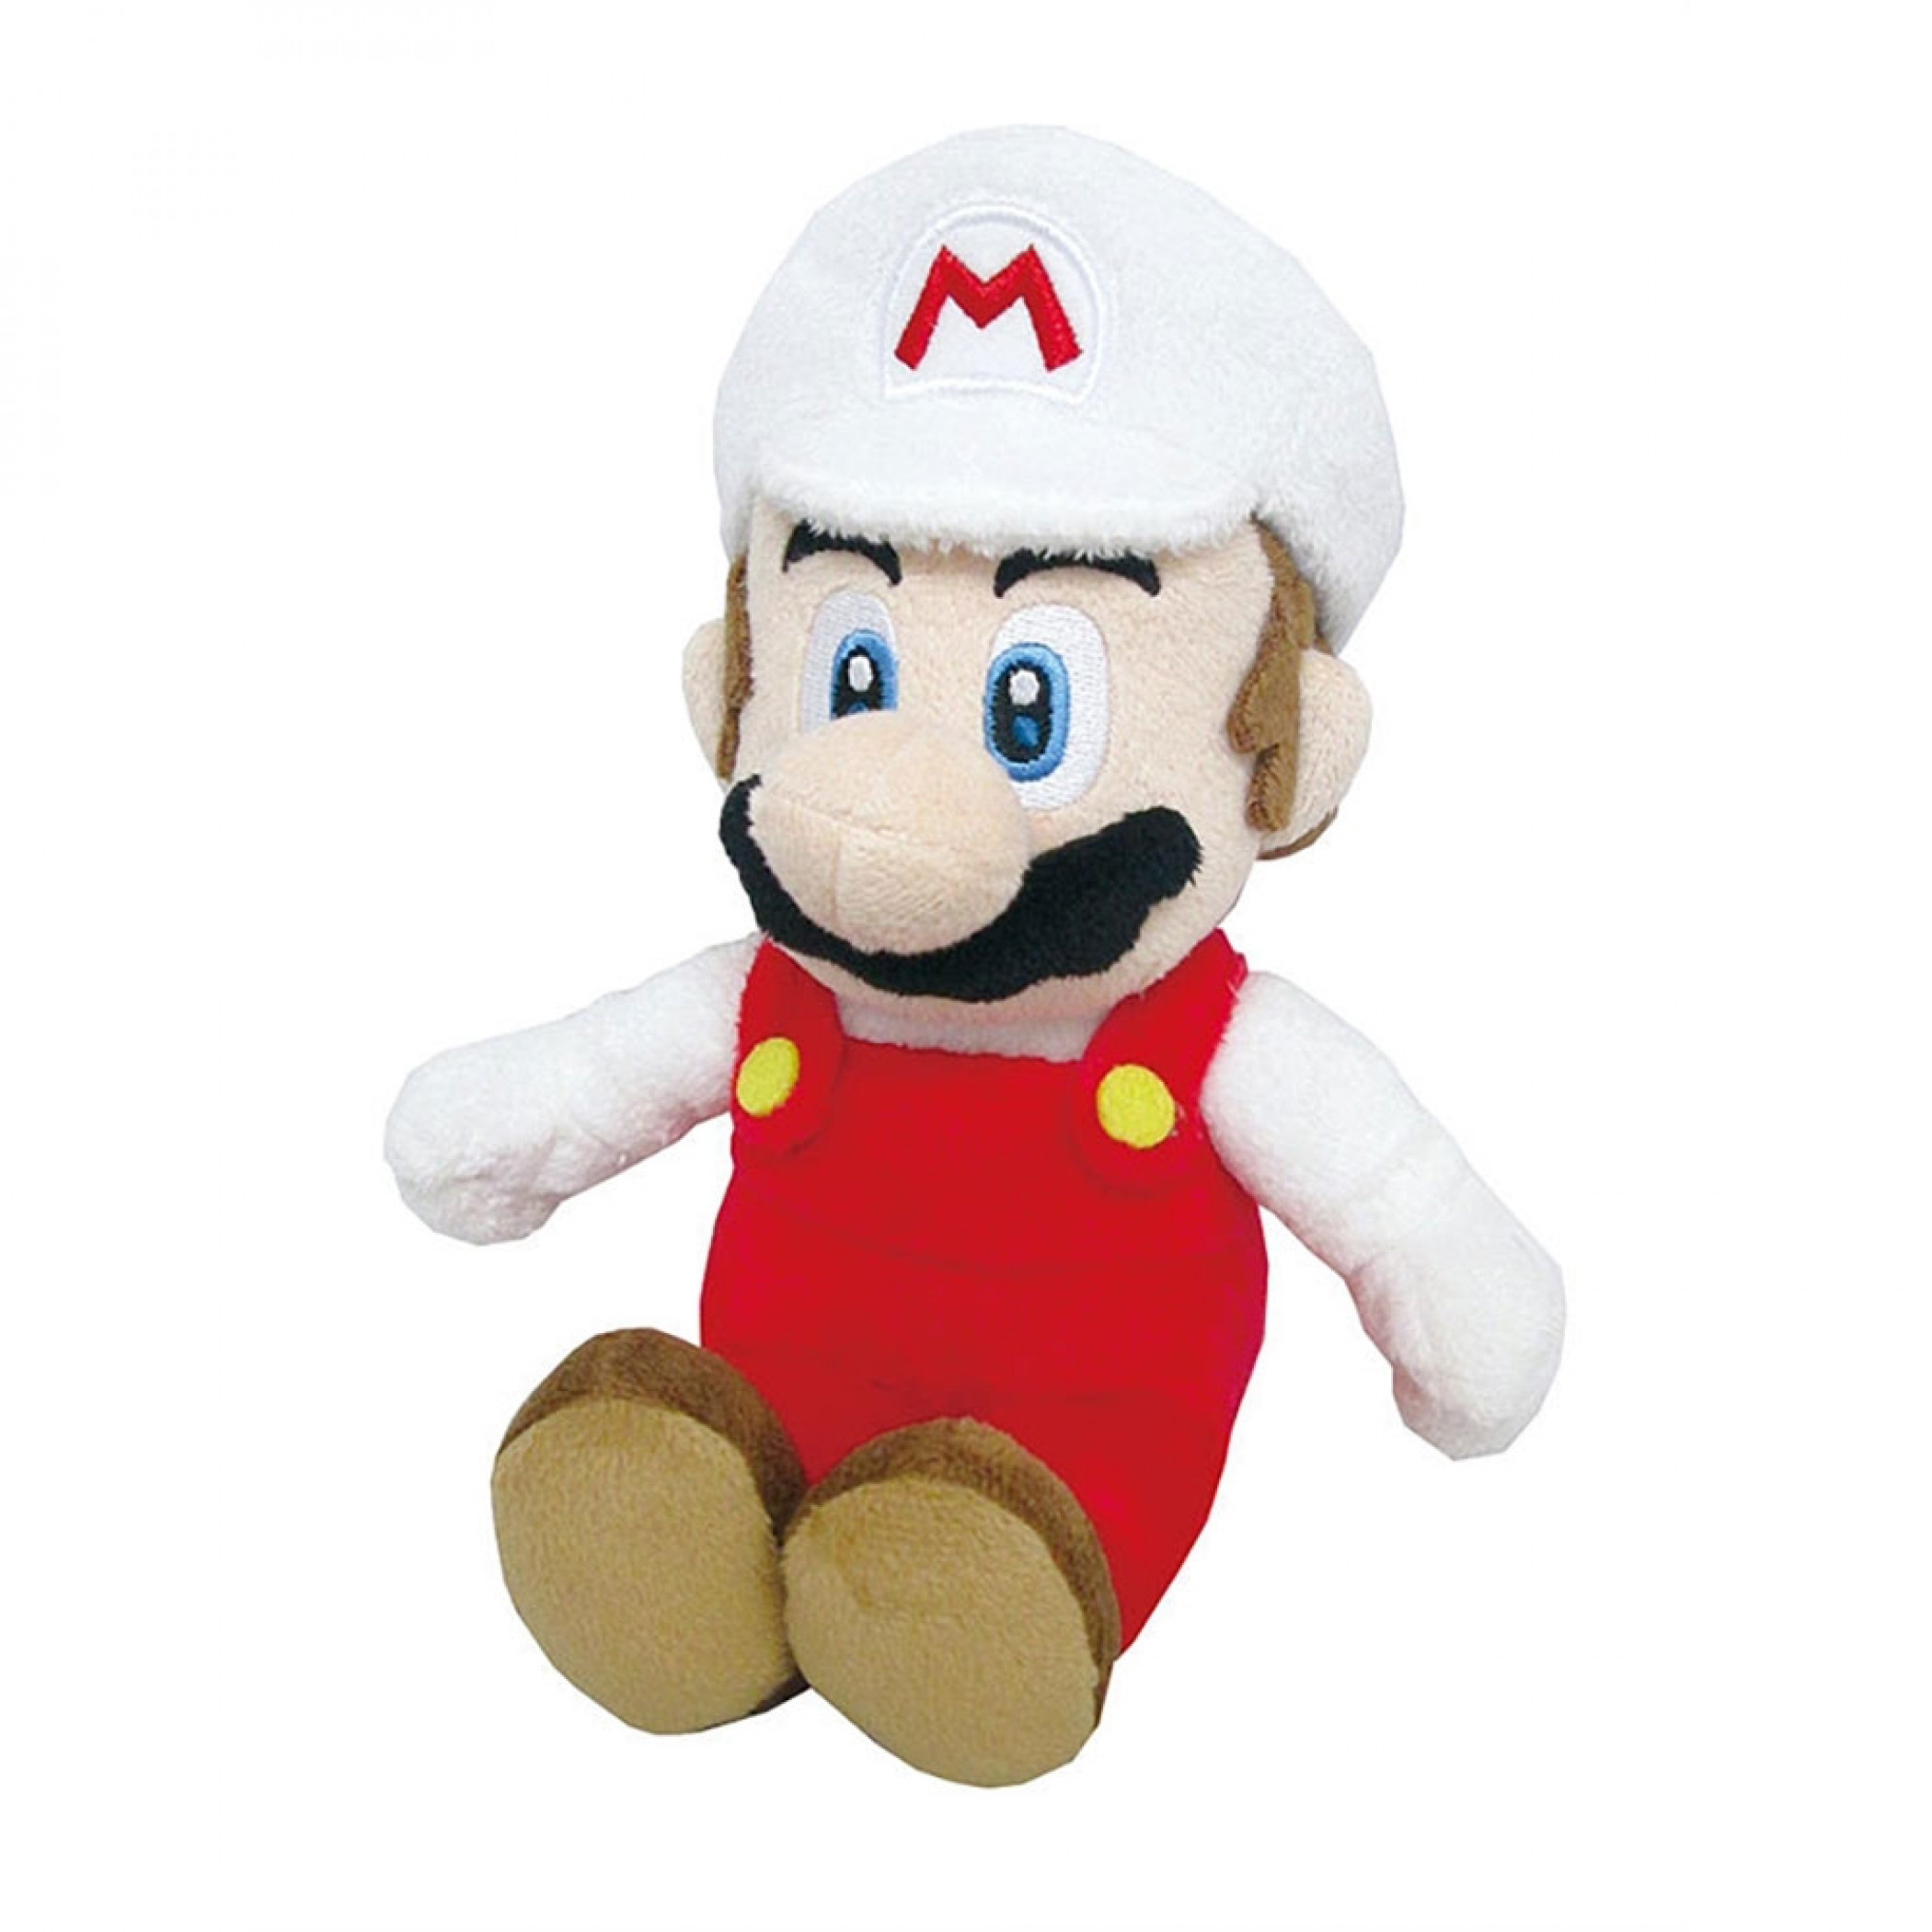 "Nintendo Super Mario Bros. Fire Mario 10"" Plush Toy"